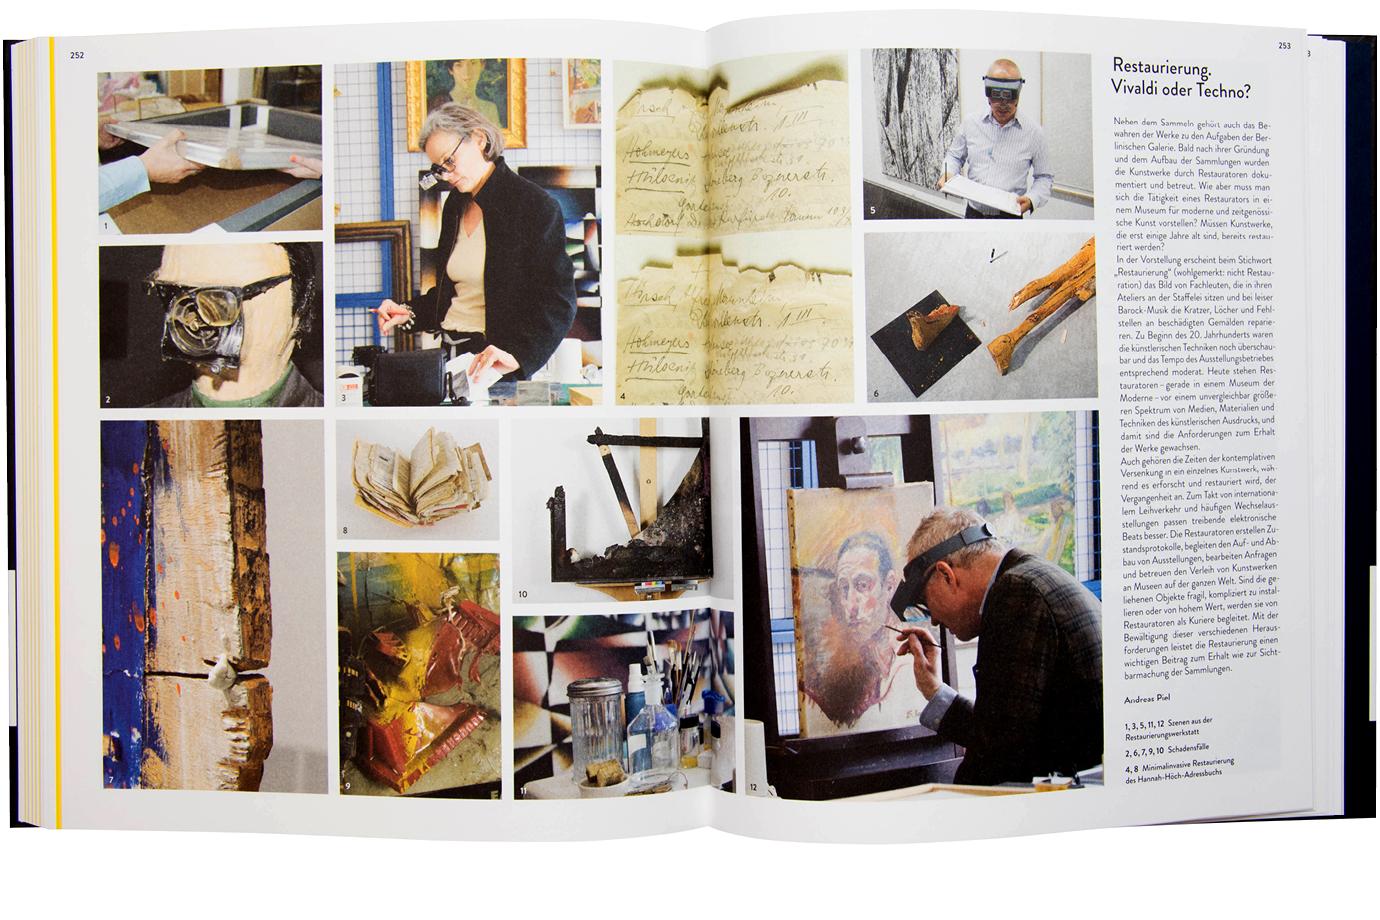 http://e-o-t.de/wordpress/wp-content/uploads/2017/06/2015_eot-BG-Jubilaeum-Book-19.jpg